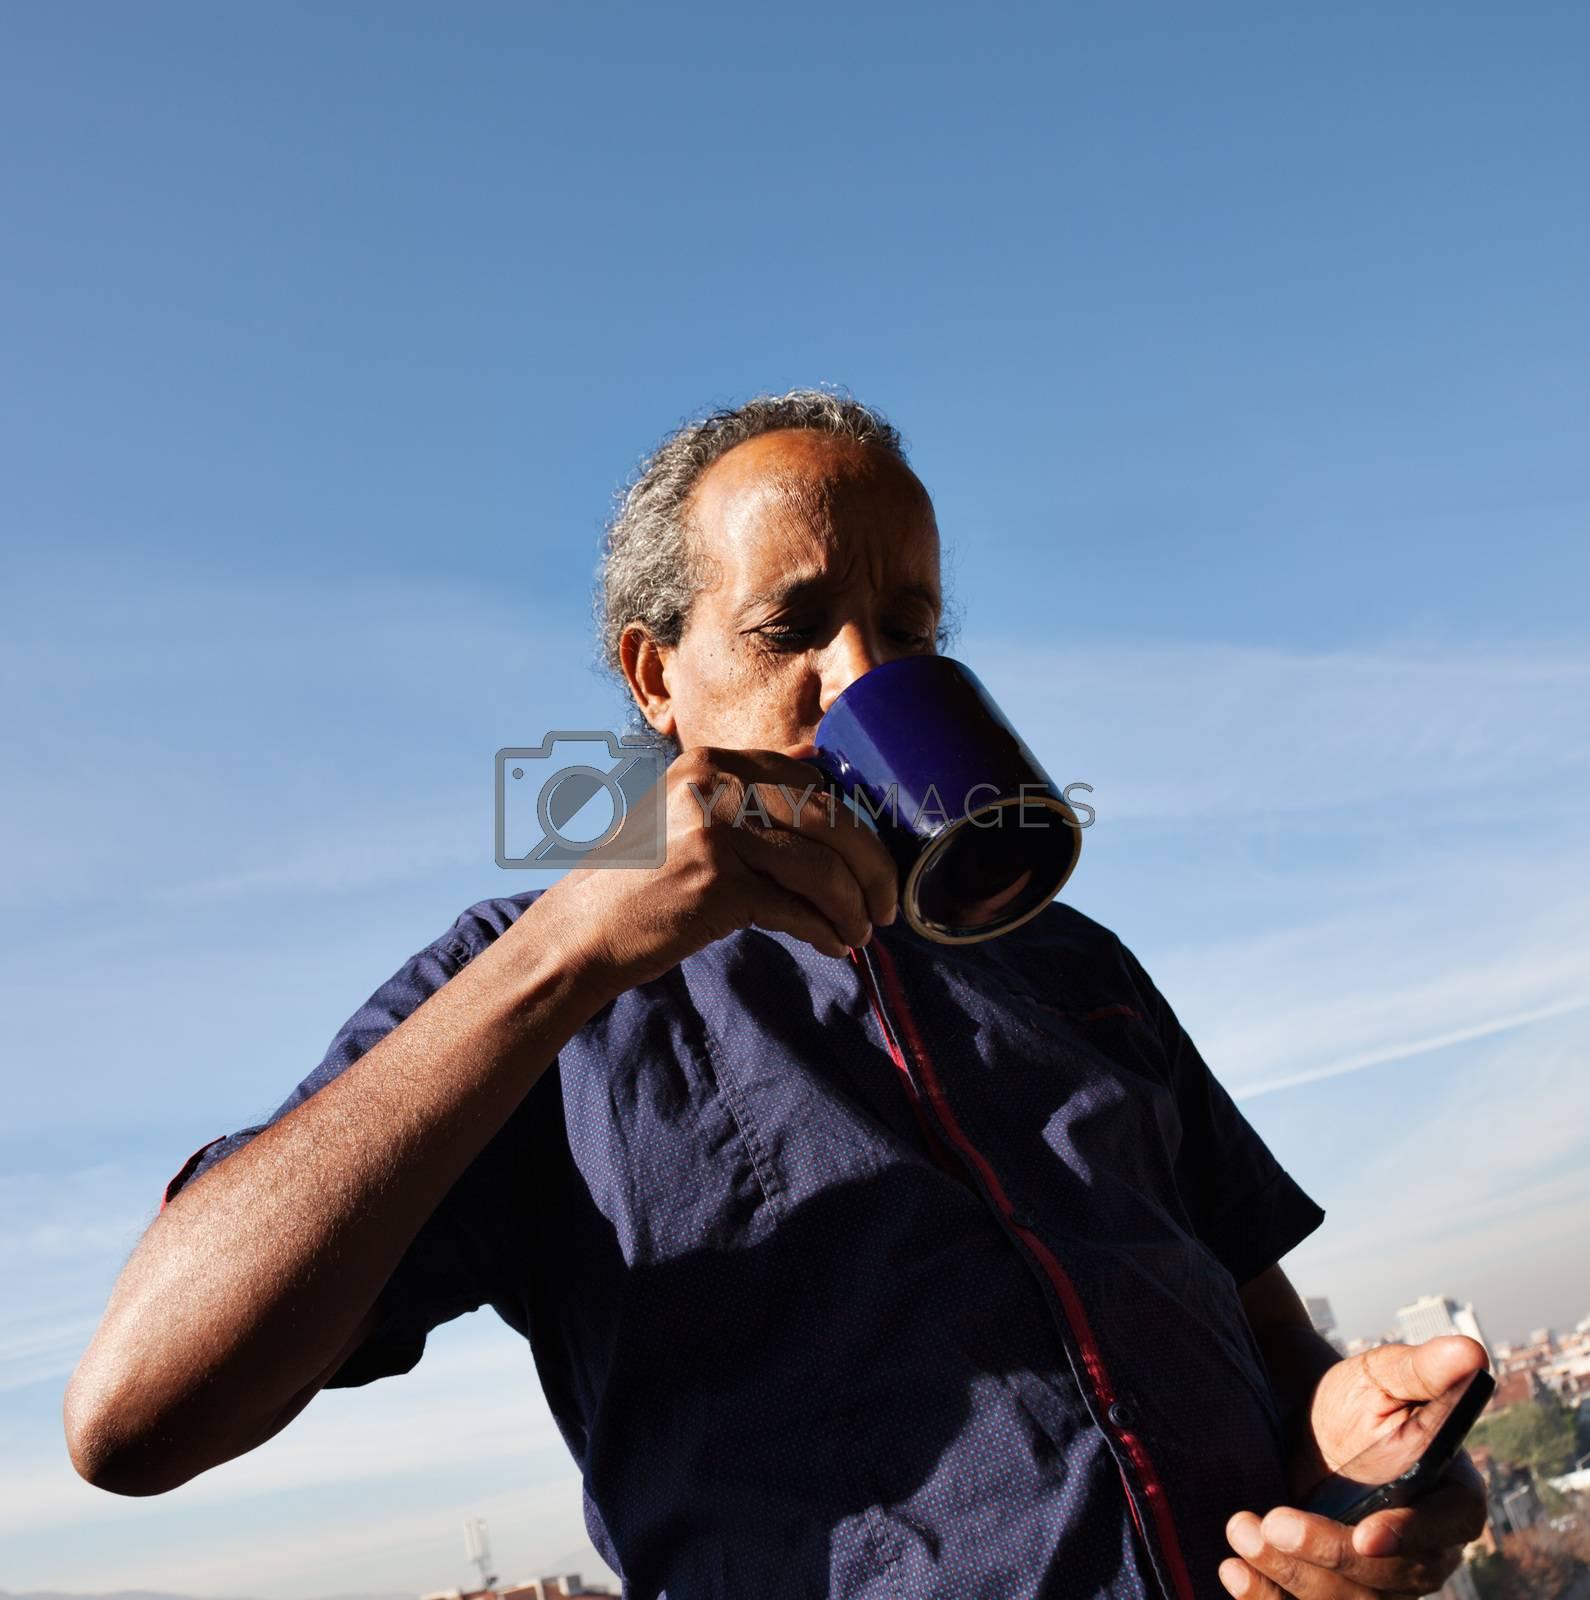 Rasta black man drinking cofee or tea, holding phone, blue sky behind.